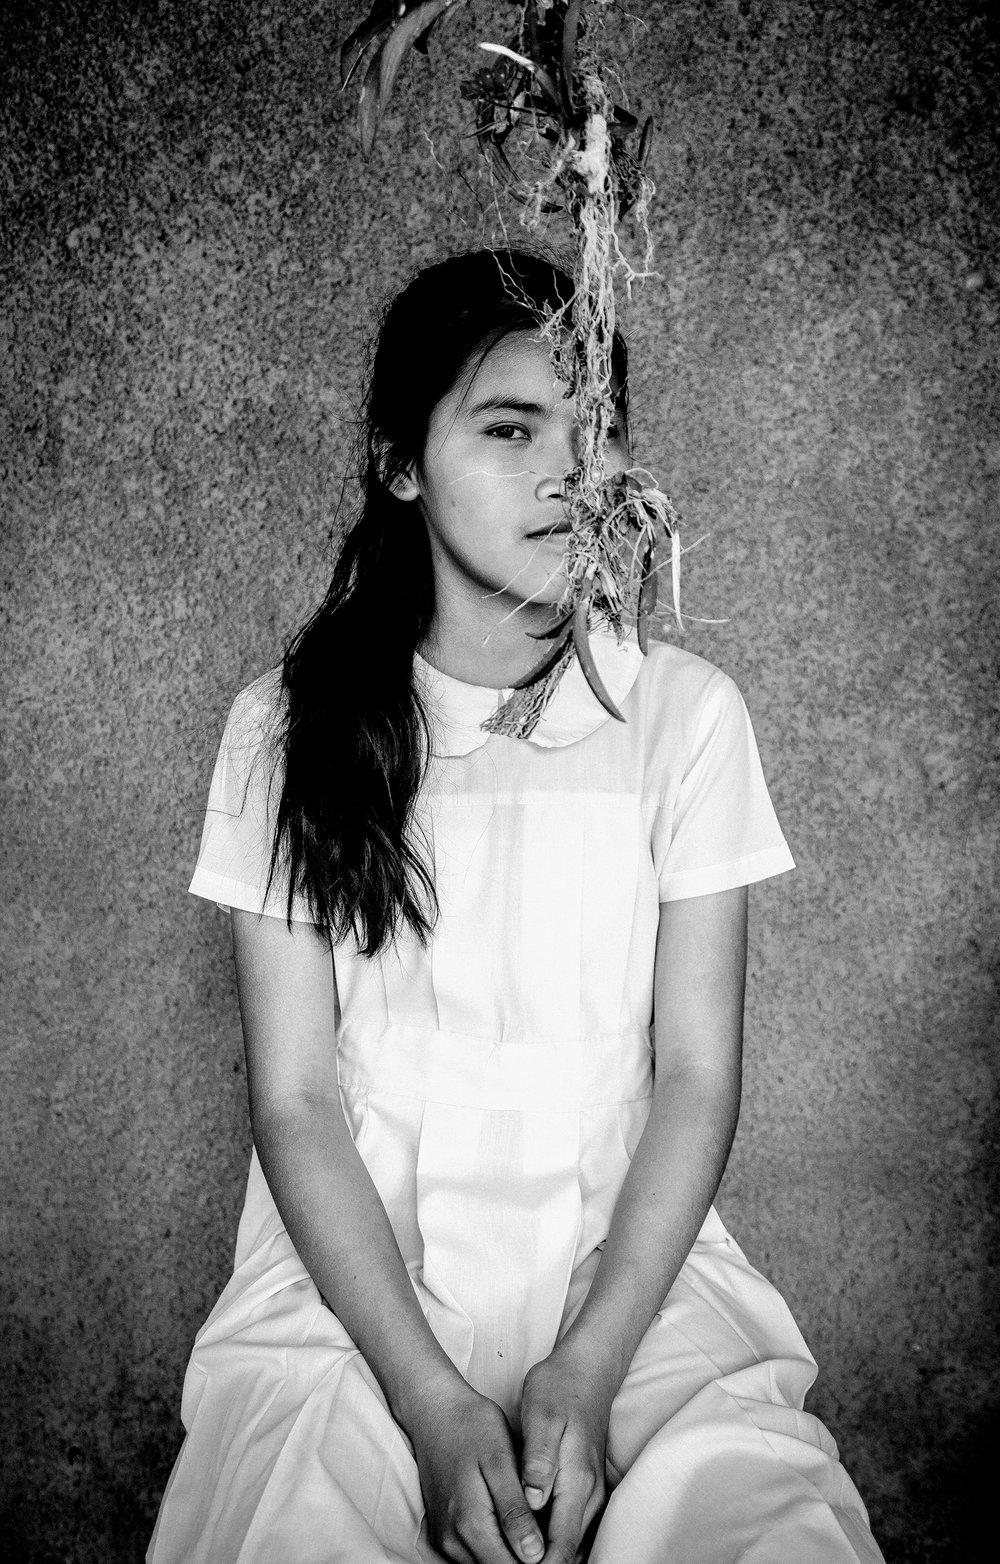 Liliana Merizalde 20fotografos Nobilior 10 baja.jpg